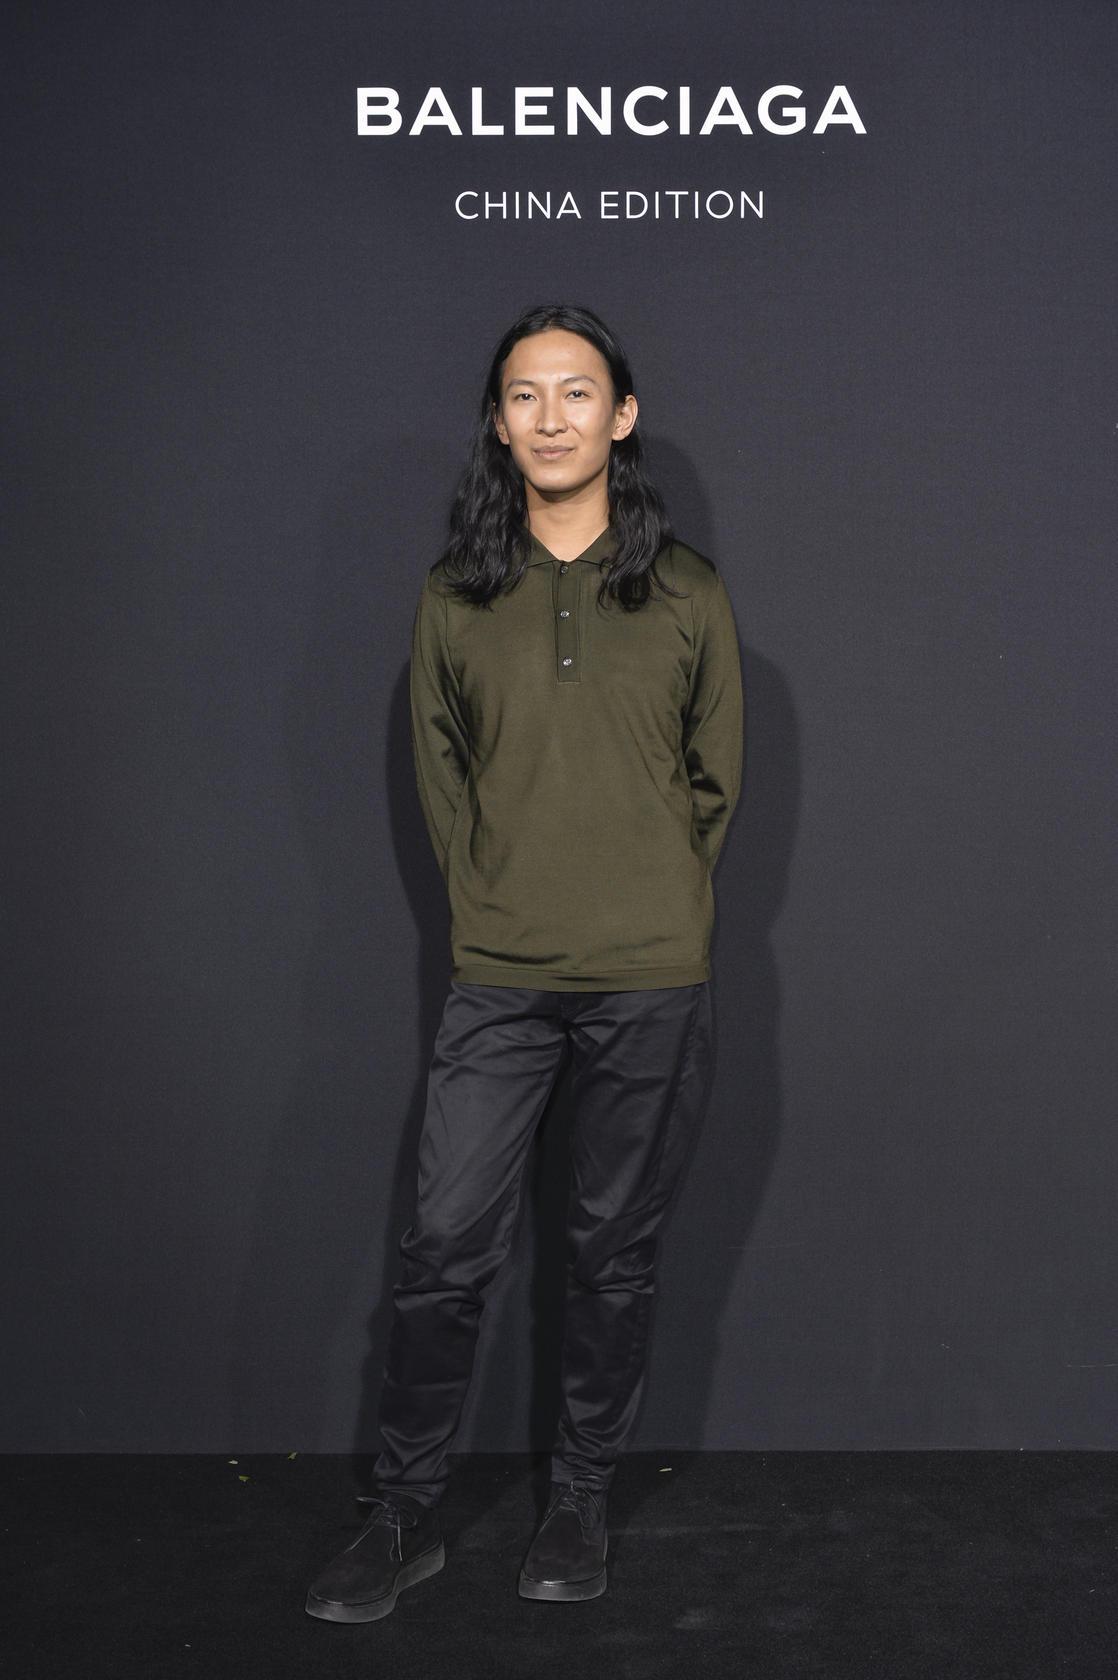 balenciaga s alexander wang brings american cool to haute couture when